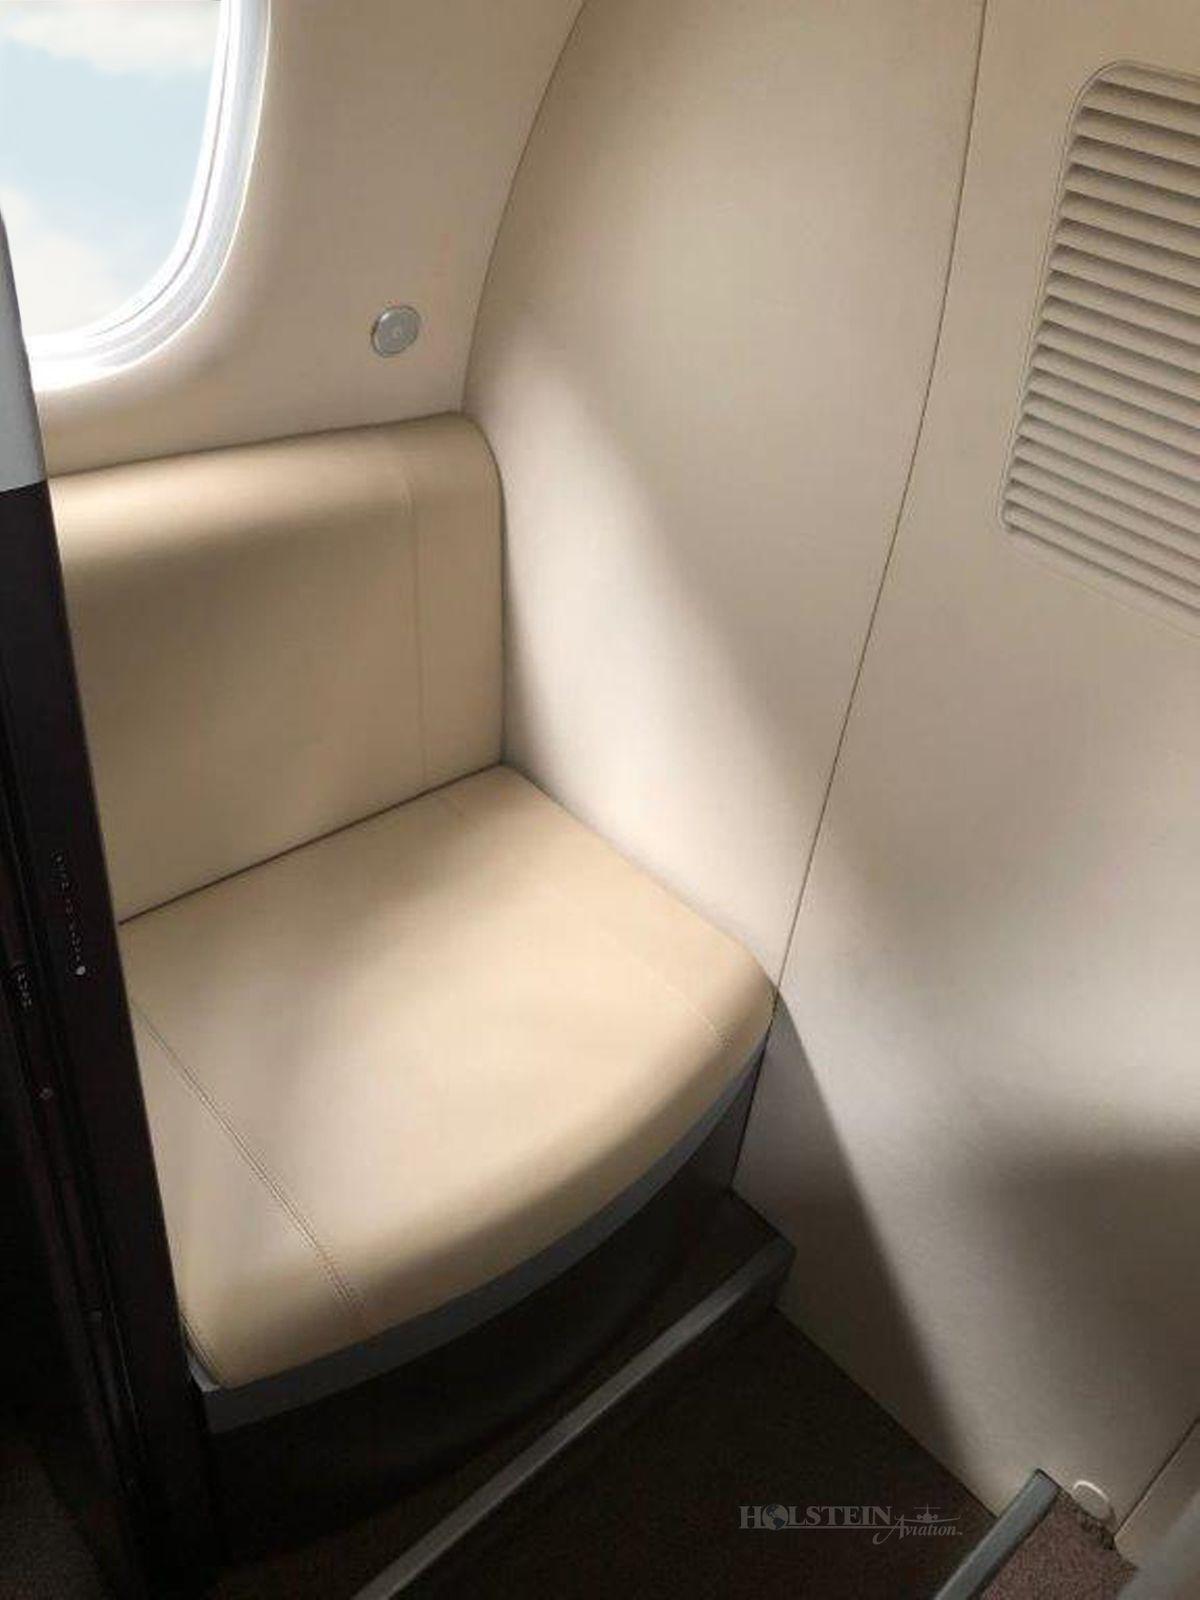 2013 Embraer Phenom 100 - SN 50000306 - VH-LWZ - Int - Lav RGB.jpg